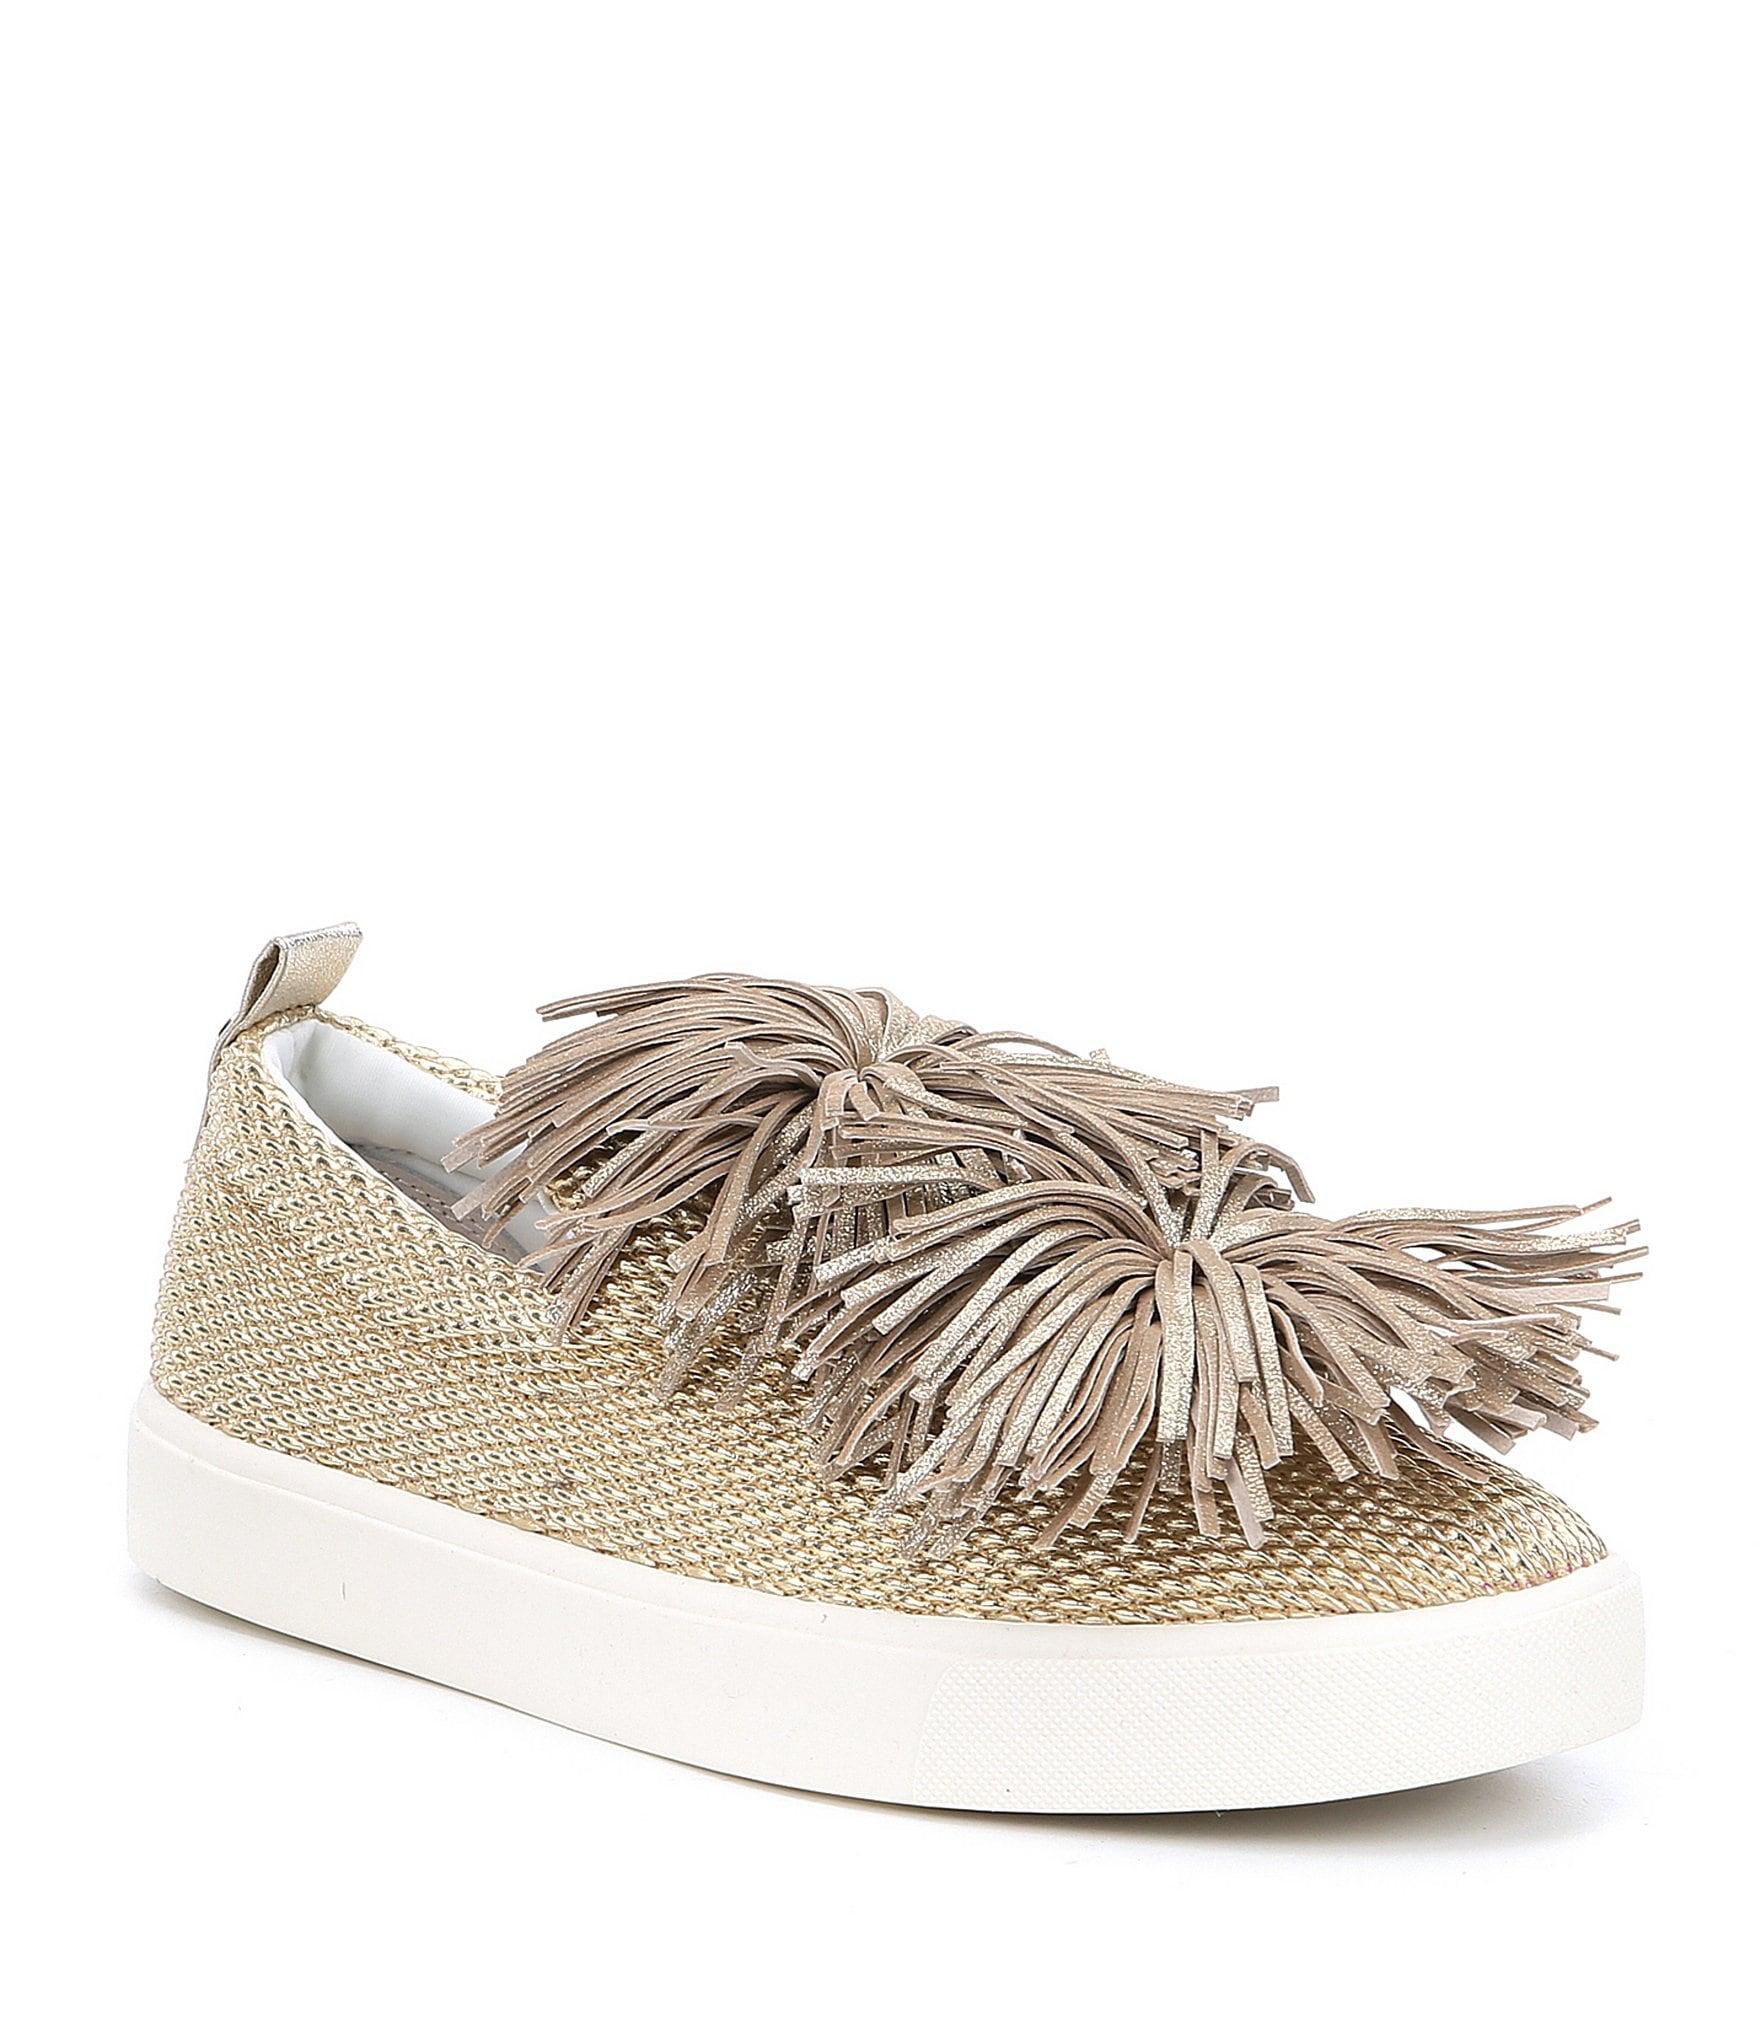 Sam Edelman Pom Pom Shoes Kids Sizes